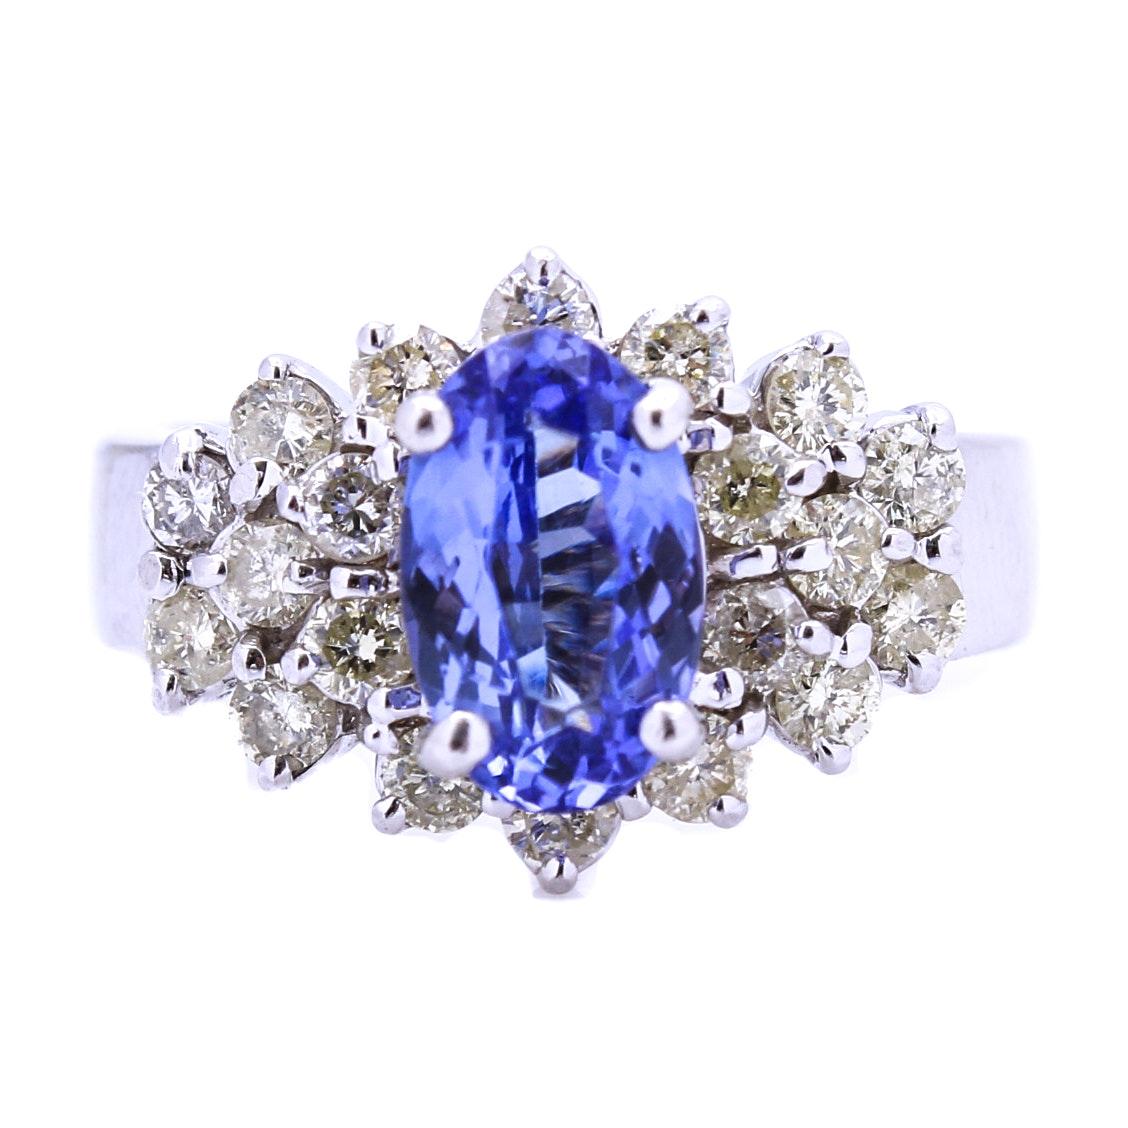 14K White Gold Tanzanite and Diamond Cocktail Ring